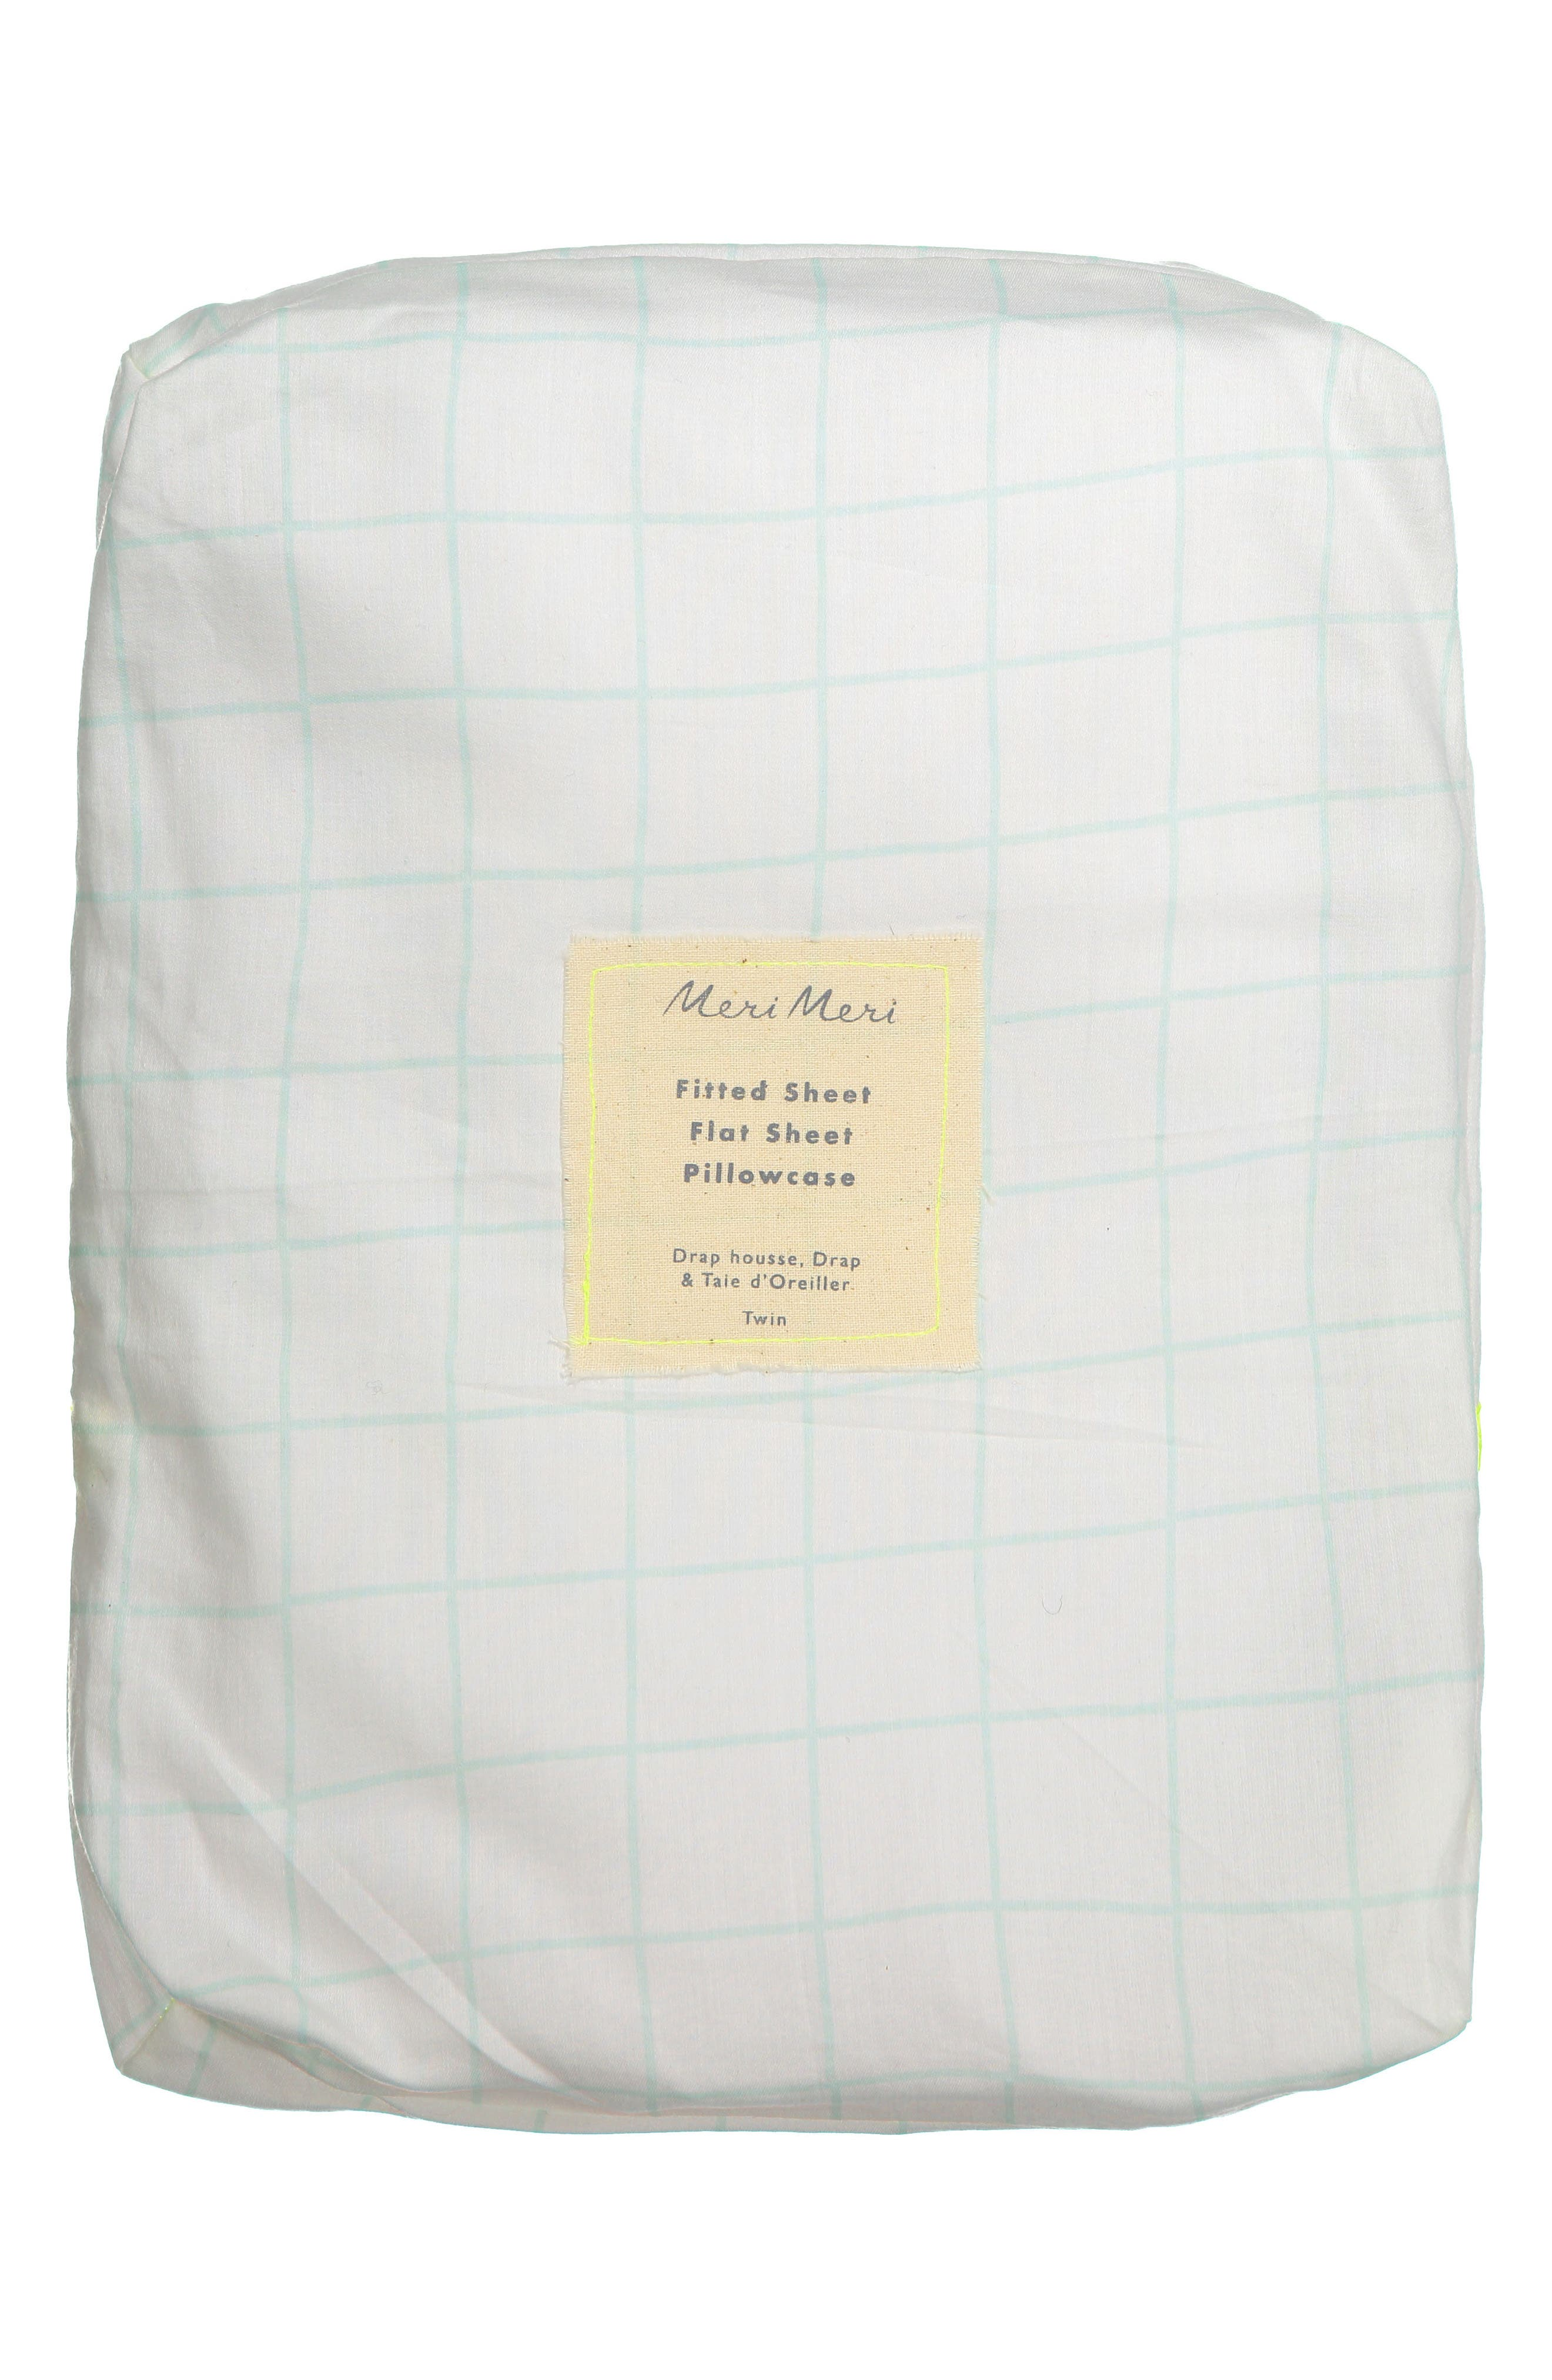 Twin Sheet & Pillowcase Set,                             Main thumbnail 1, color,                             MINT